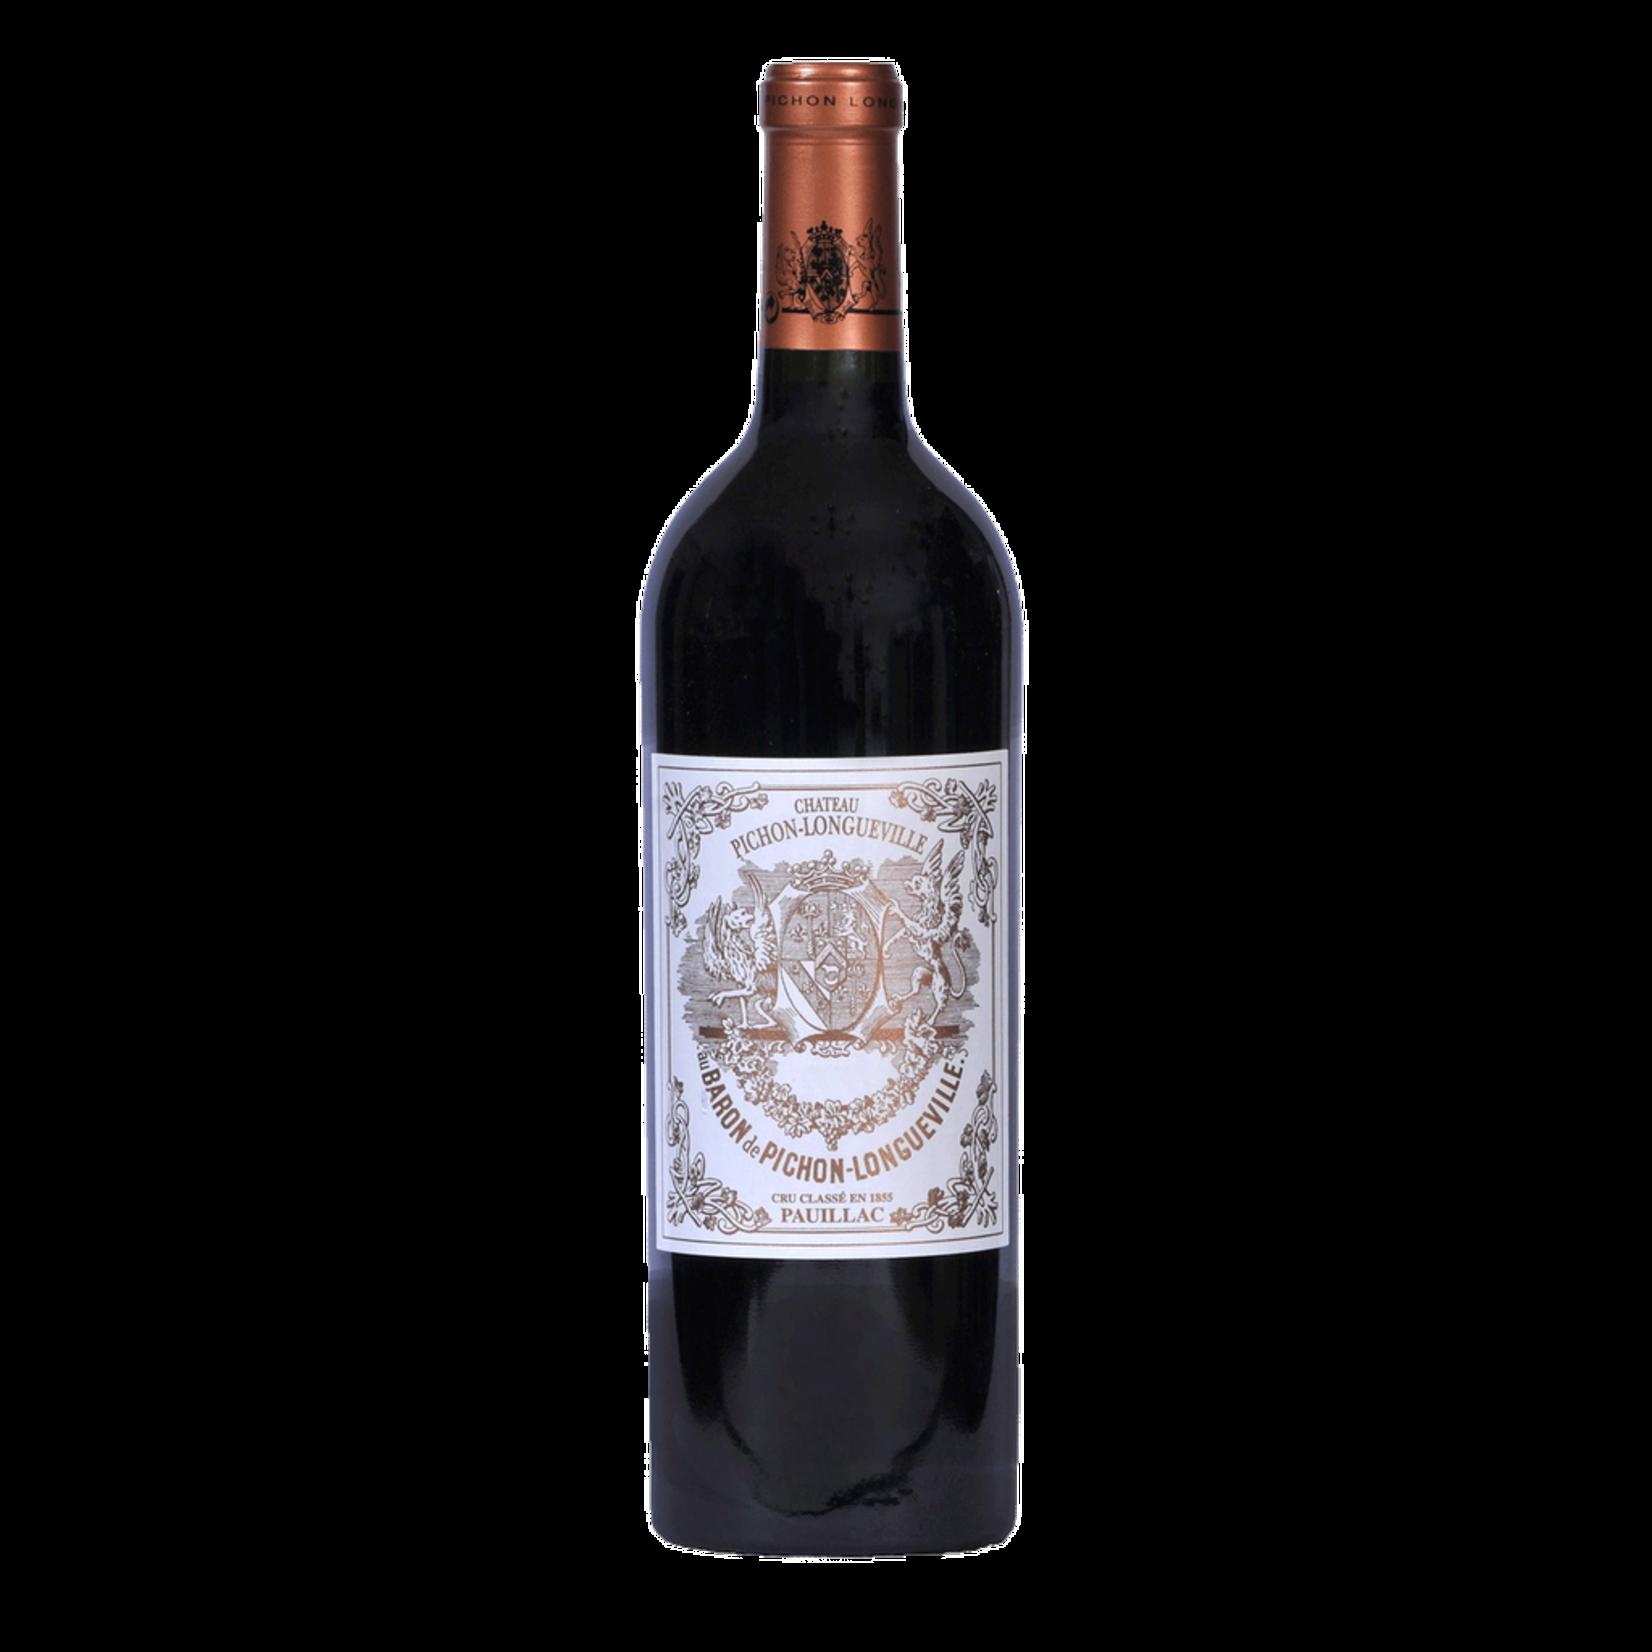 Wine Chateau Pichon Baron 1998